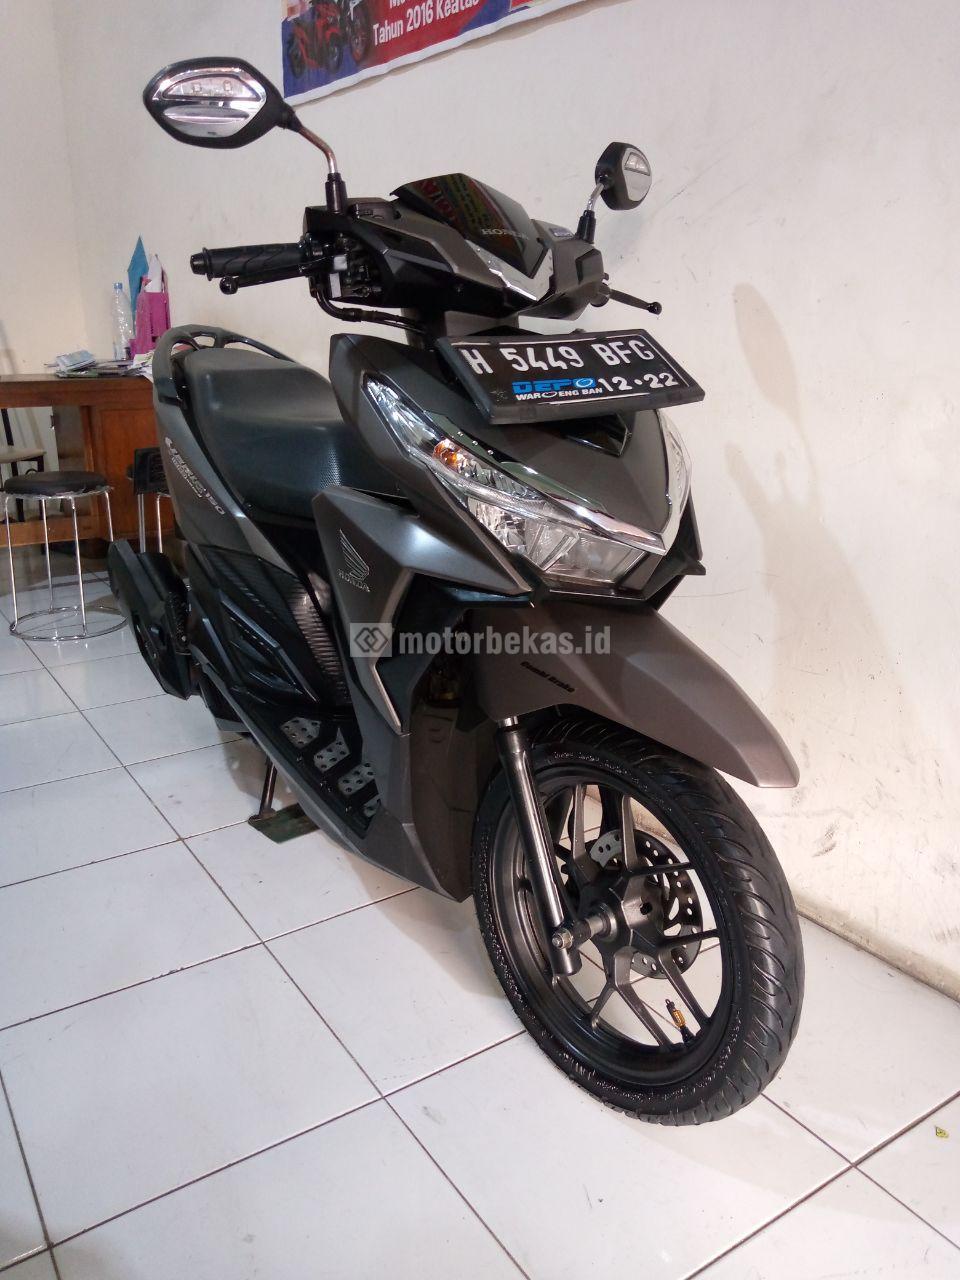 HONDA VARIO 150 SPORTY  3355 motorbekas.id